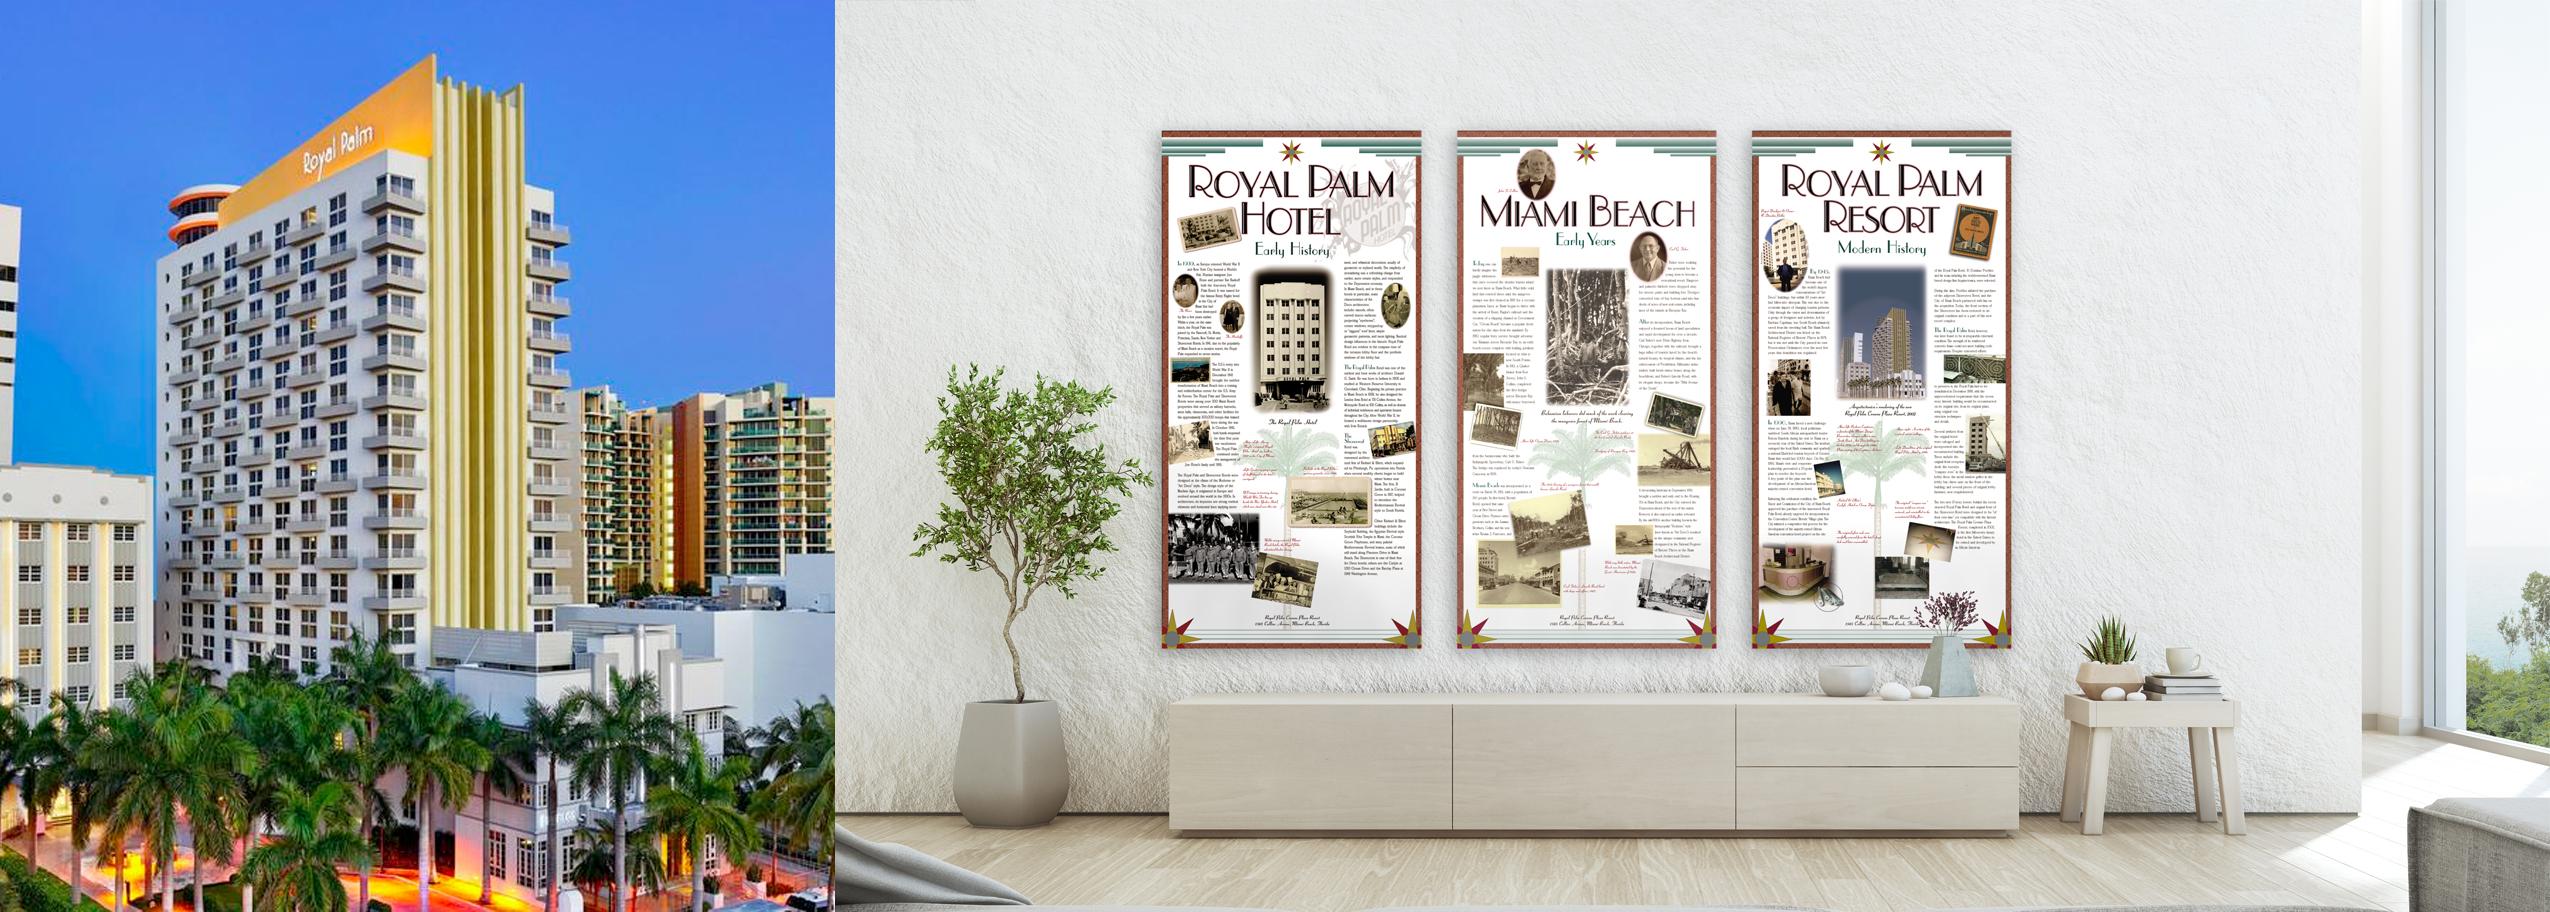 Royal Palm Lobby Installation